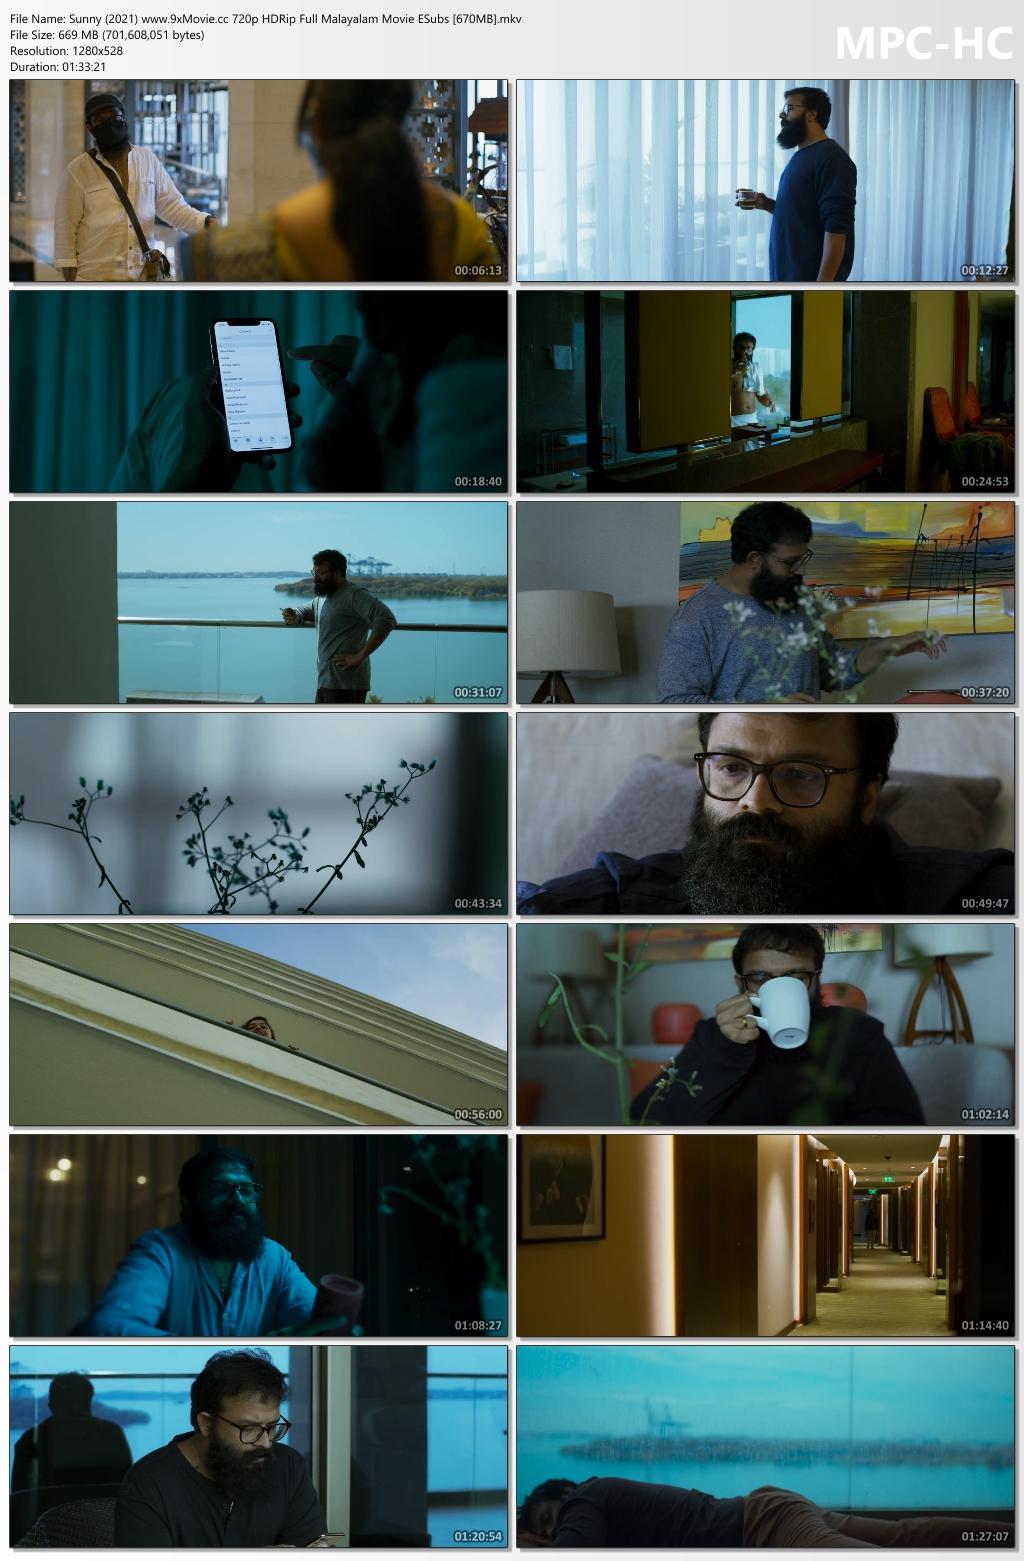 Sunny-2021-www-9x-Movie-cc-720p-HDRip-Full-Malayalam-Movie-ESubs-670-MB-mkv